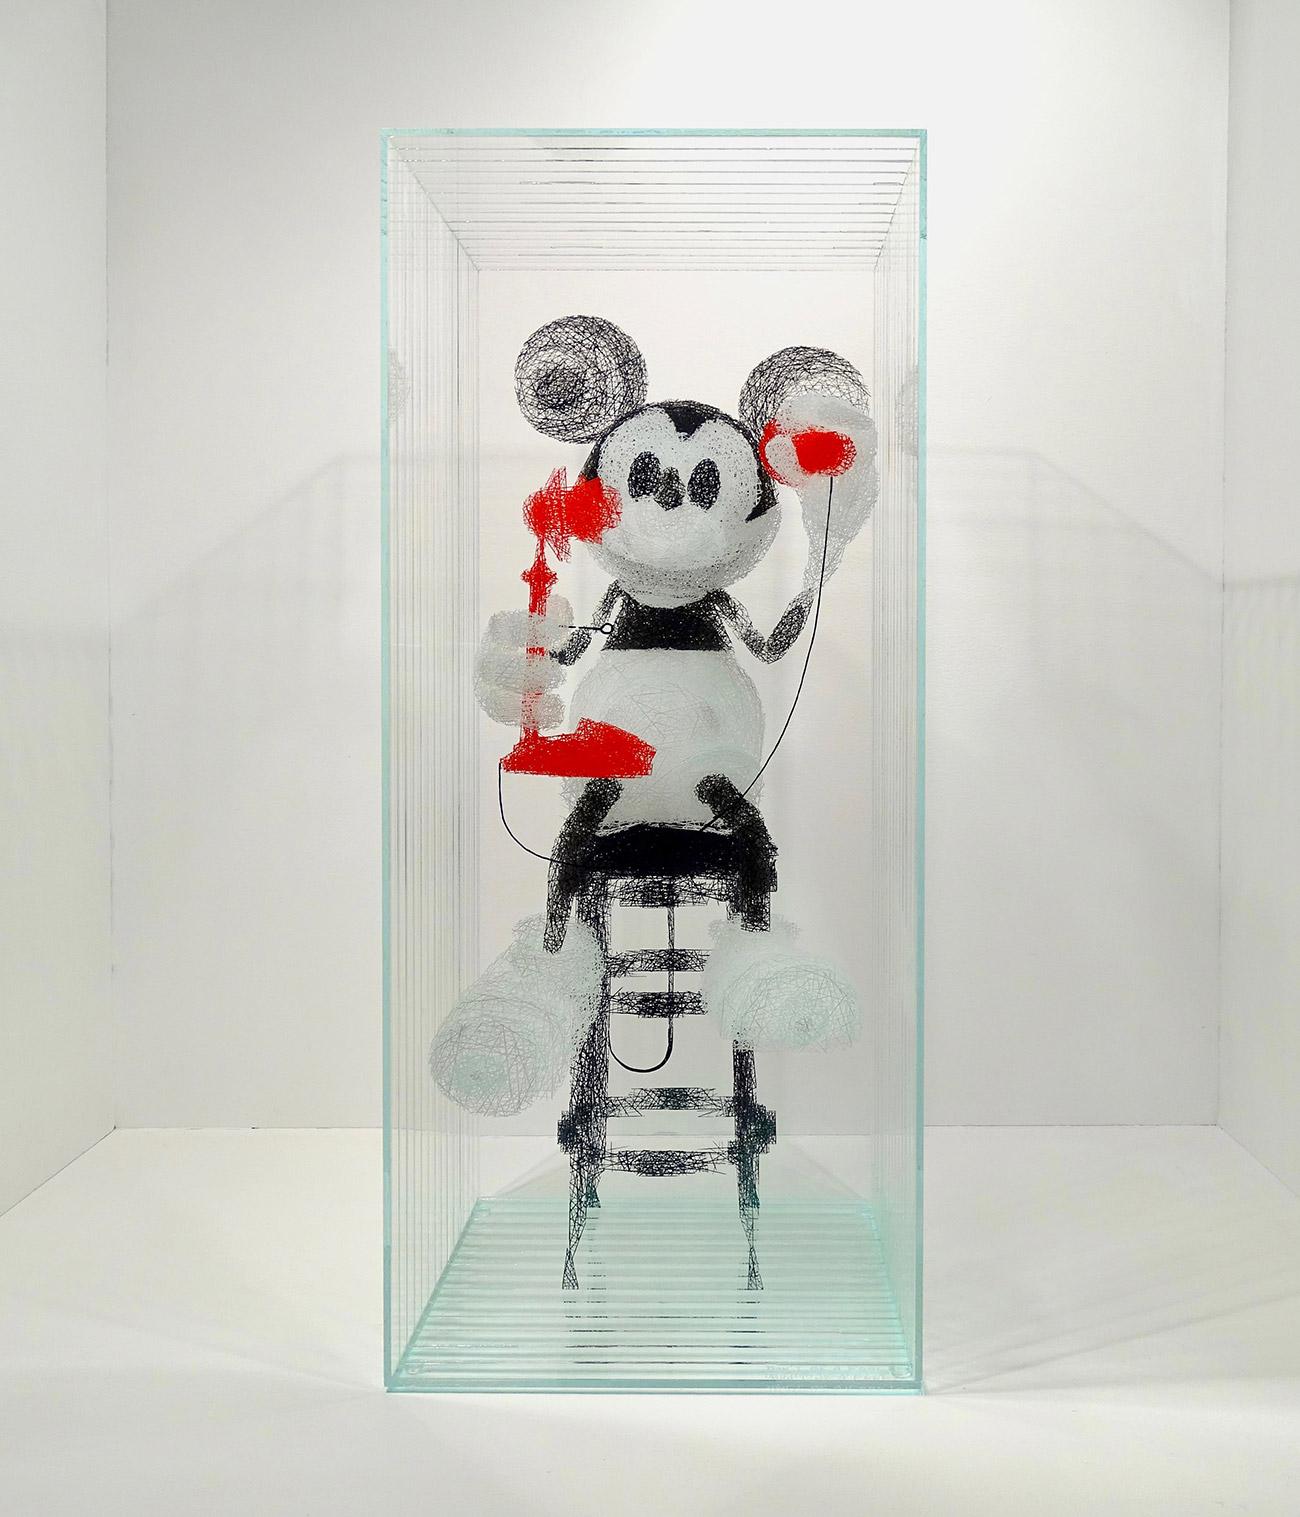 1-sebastien-creteur-DBAF-a-galerie-bettina-art-contemporain-paris.jpg